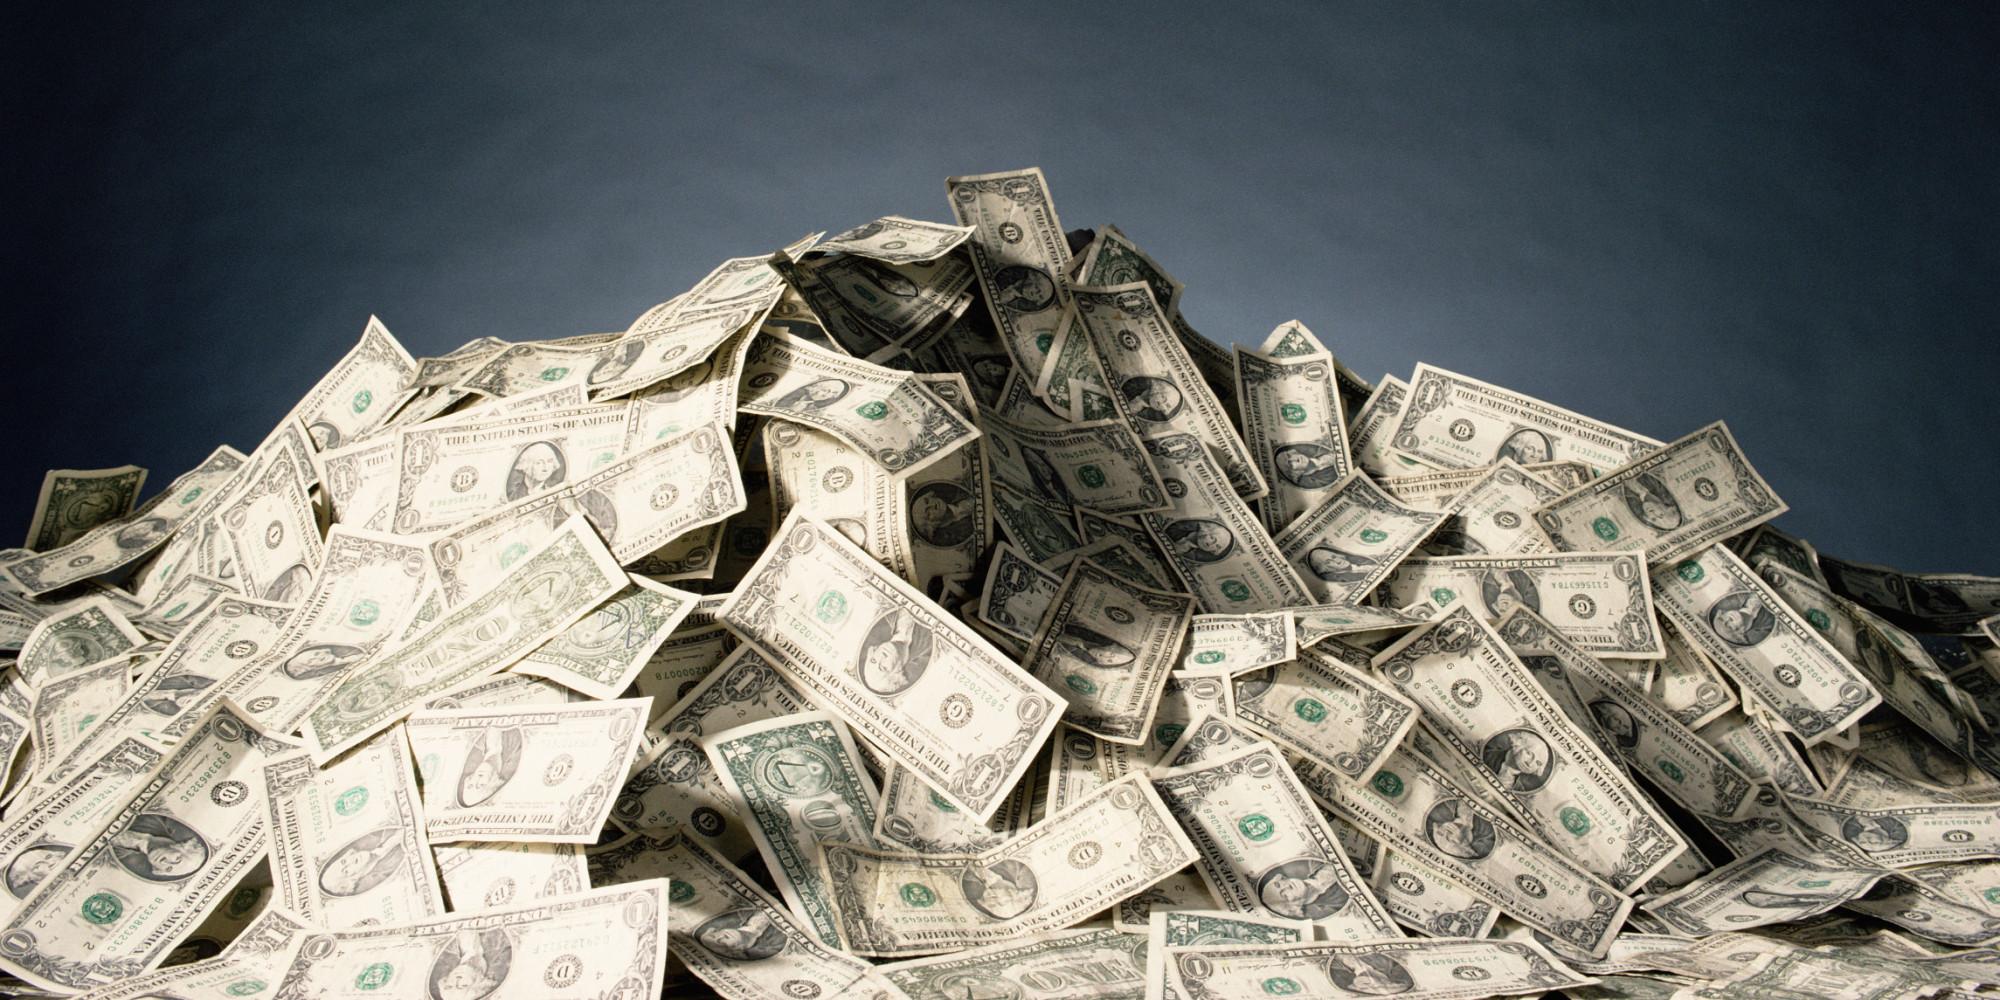 Pile of cash